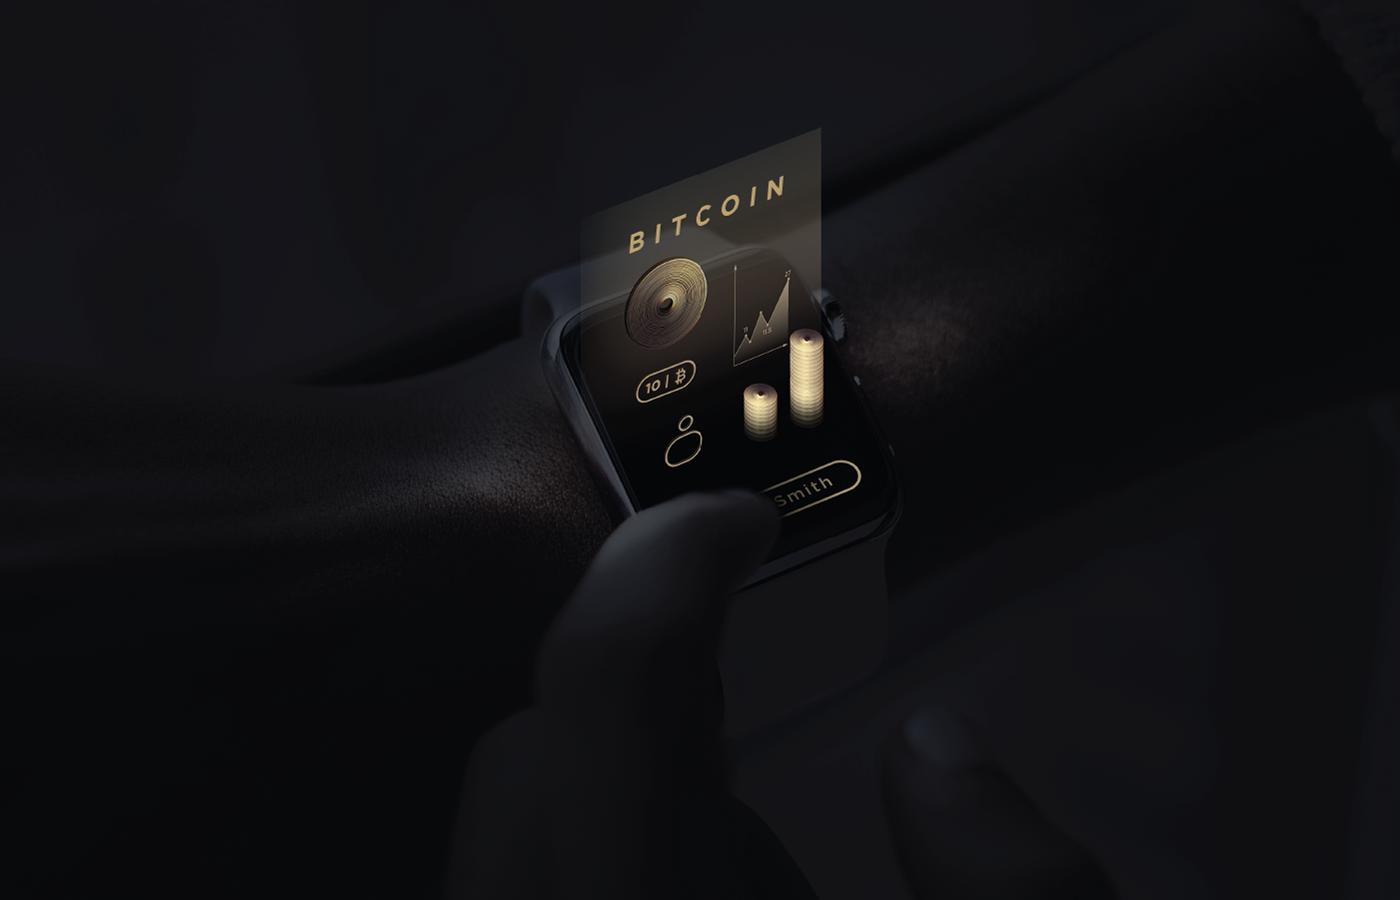 concept bitcoin gold future world hologram galaxy particles blockchain Data